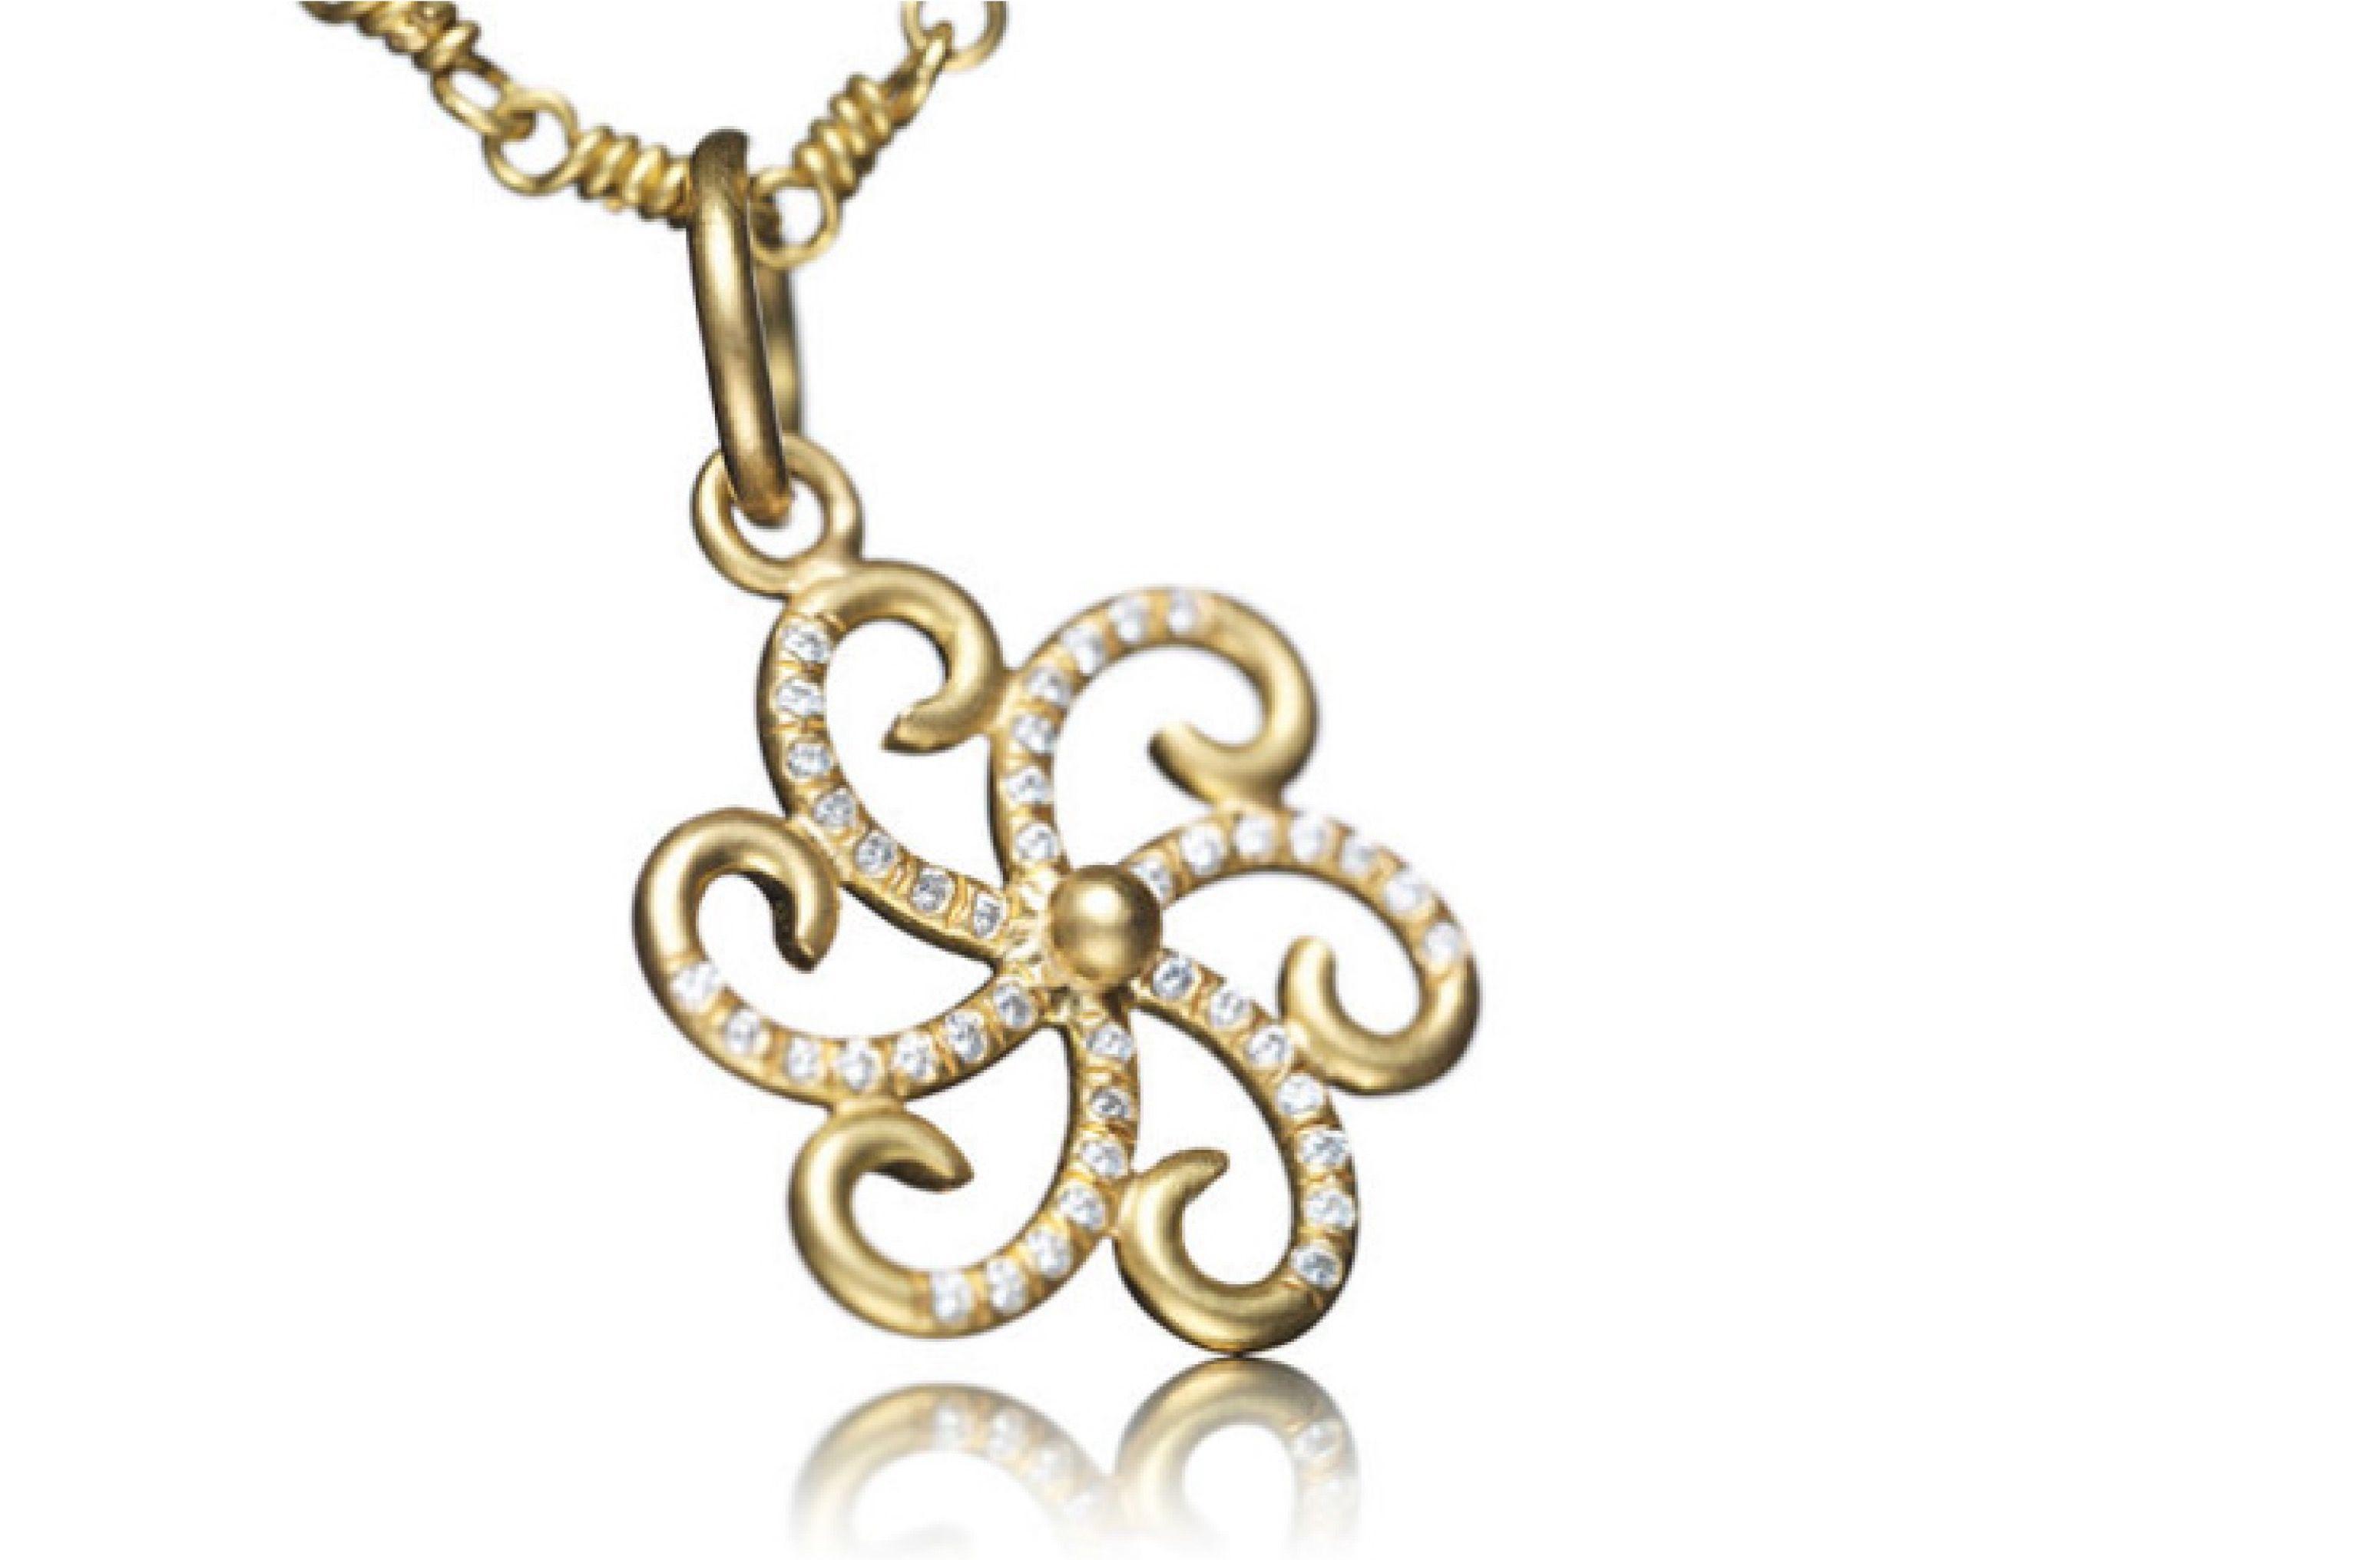 JewelryWhite_18.jpg